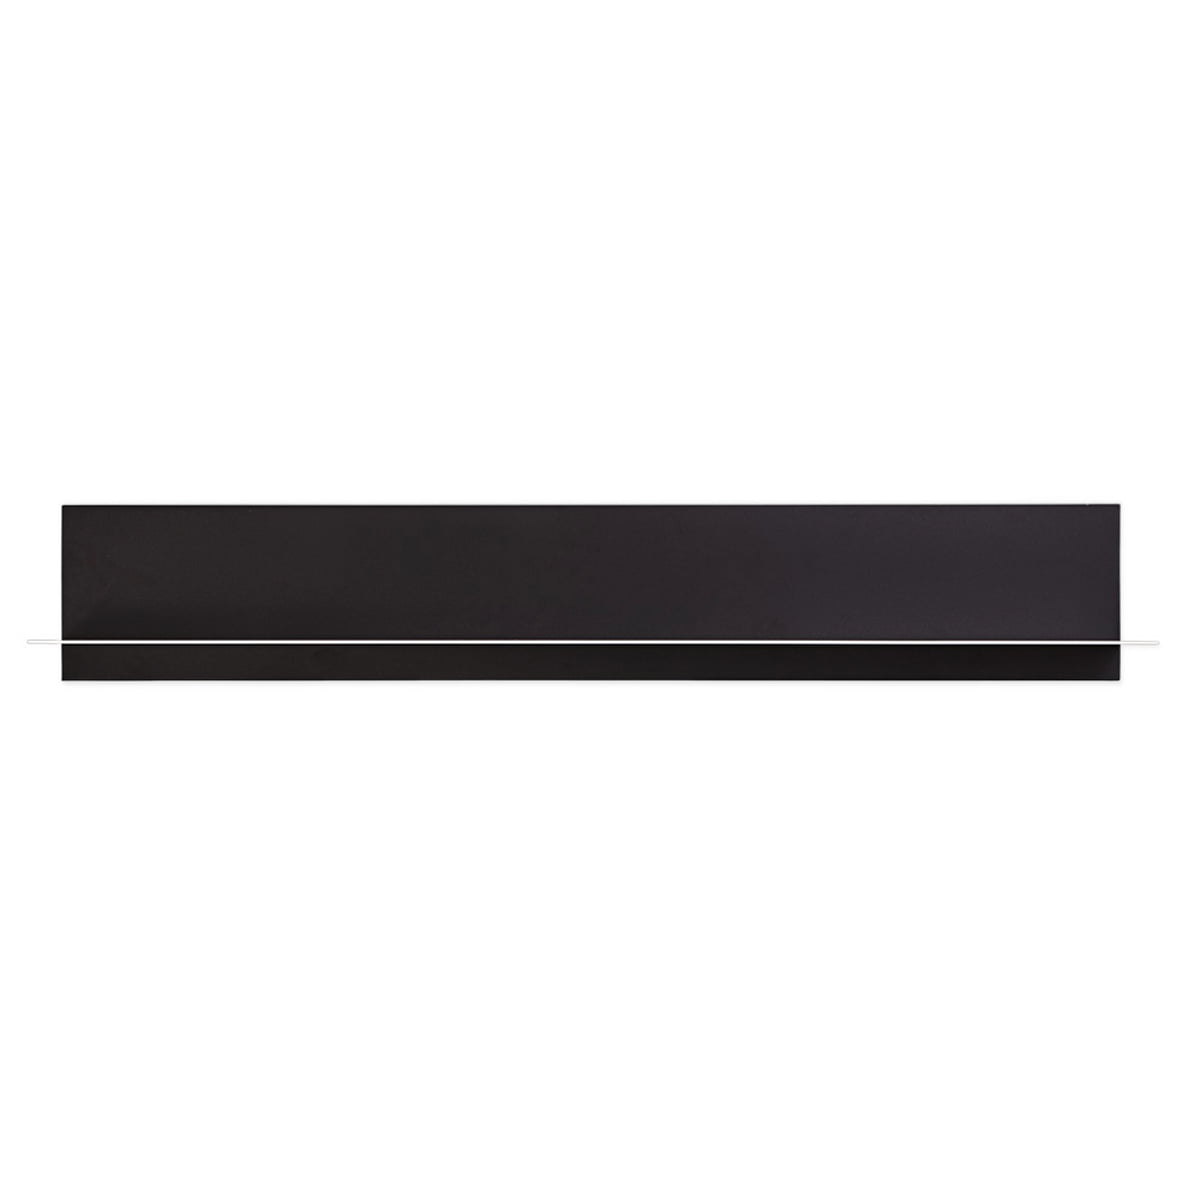 regal schwarz cheap bucherregal schwarz regal x ikea billy hemnes with regal schwarz cool. Black Bedroom Furniture Sets. Home Design Ideas